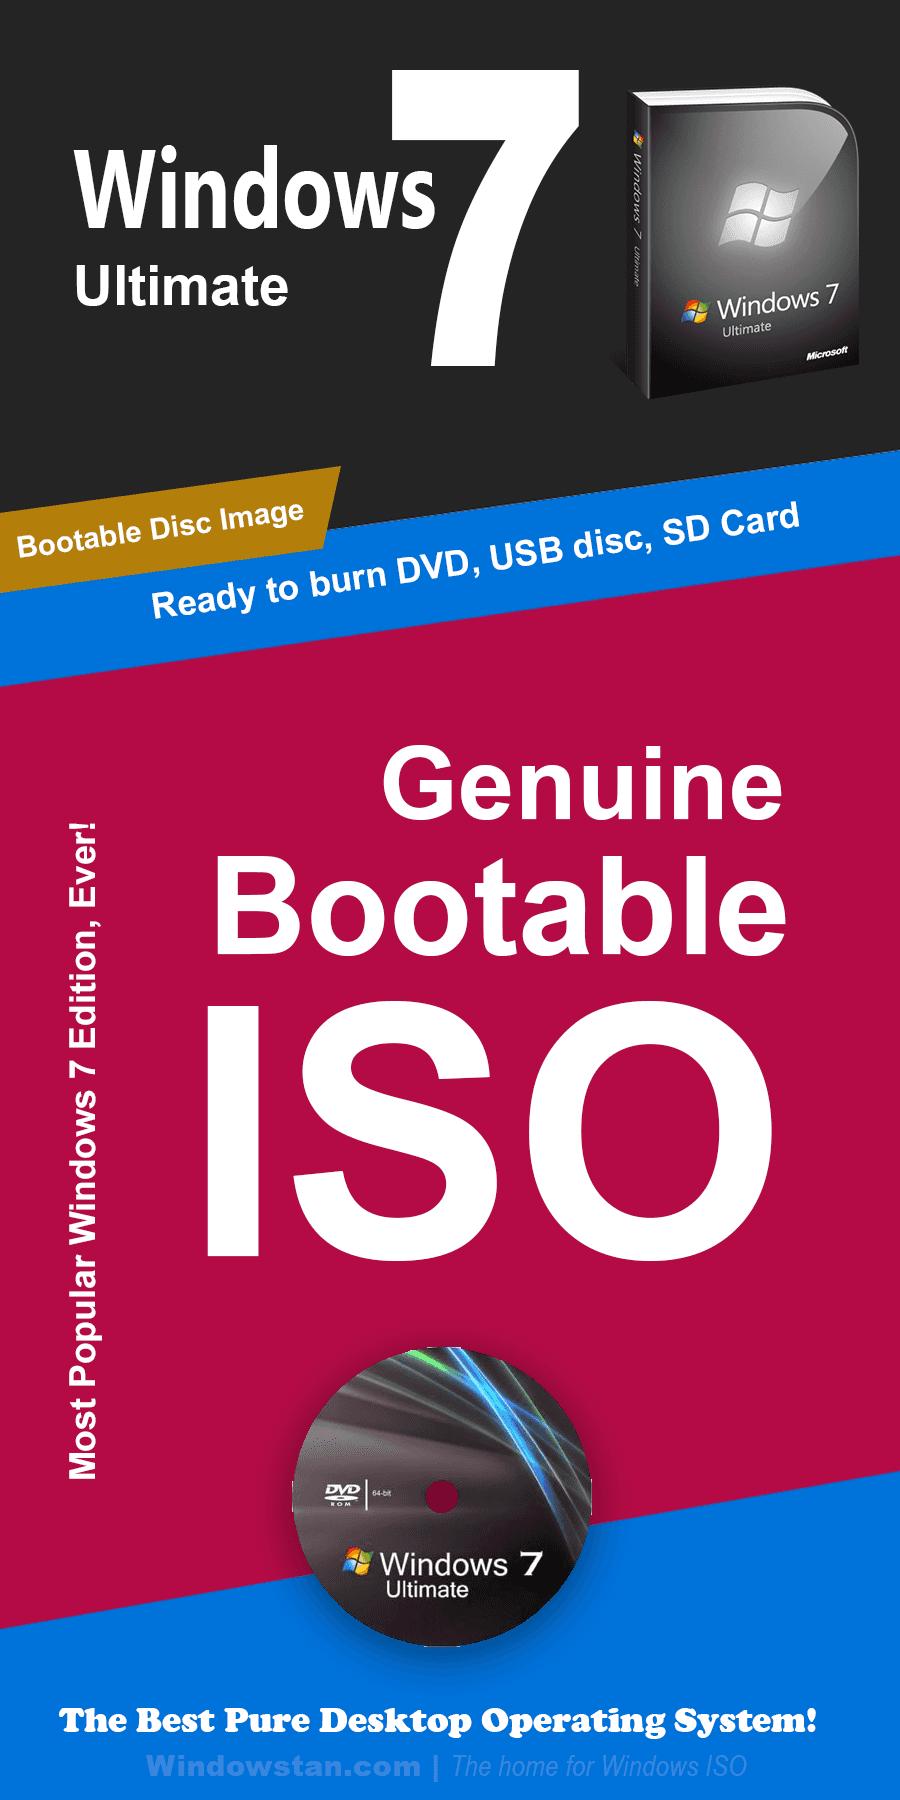 Infographic - Windows 7 Ultimate ISO - Windowstan